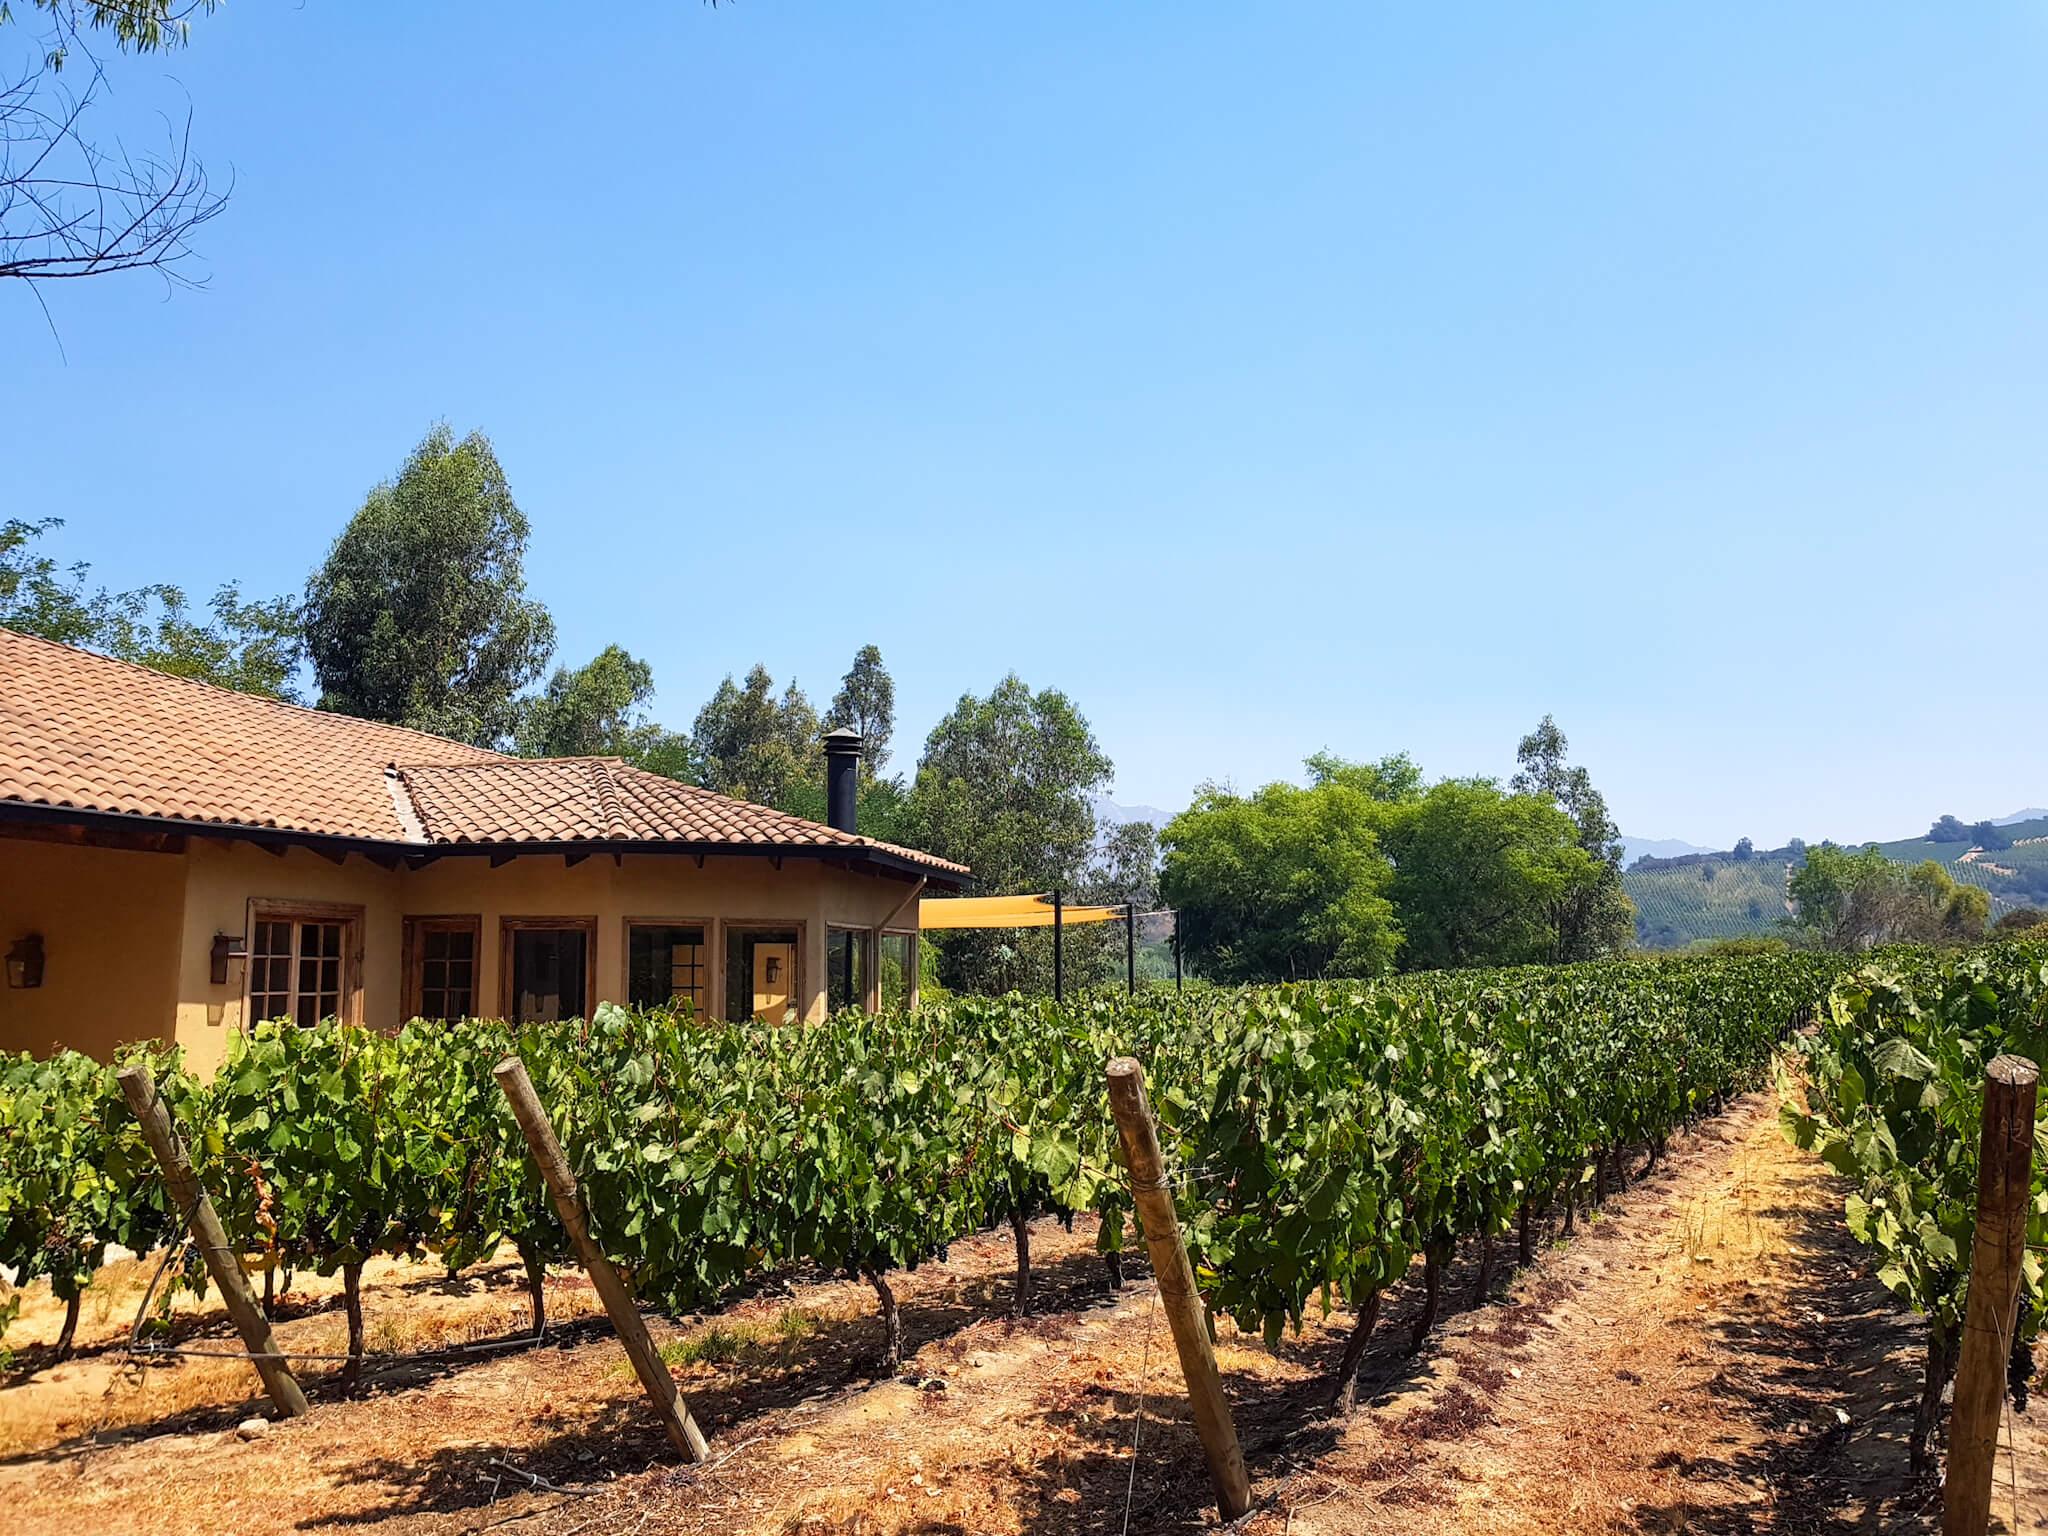 Santa Cruz luxury accommodation within a vineyard